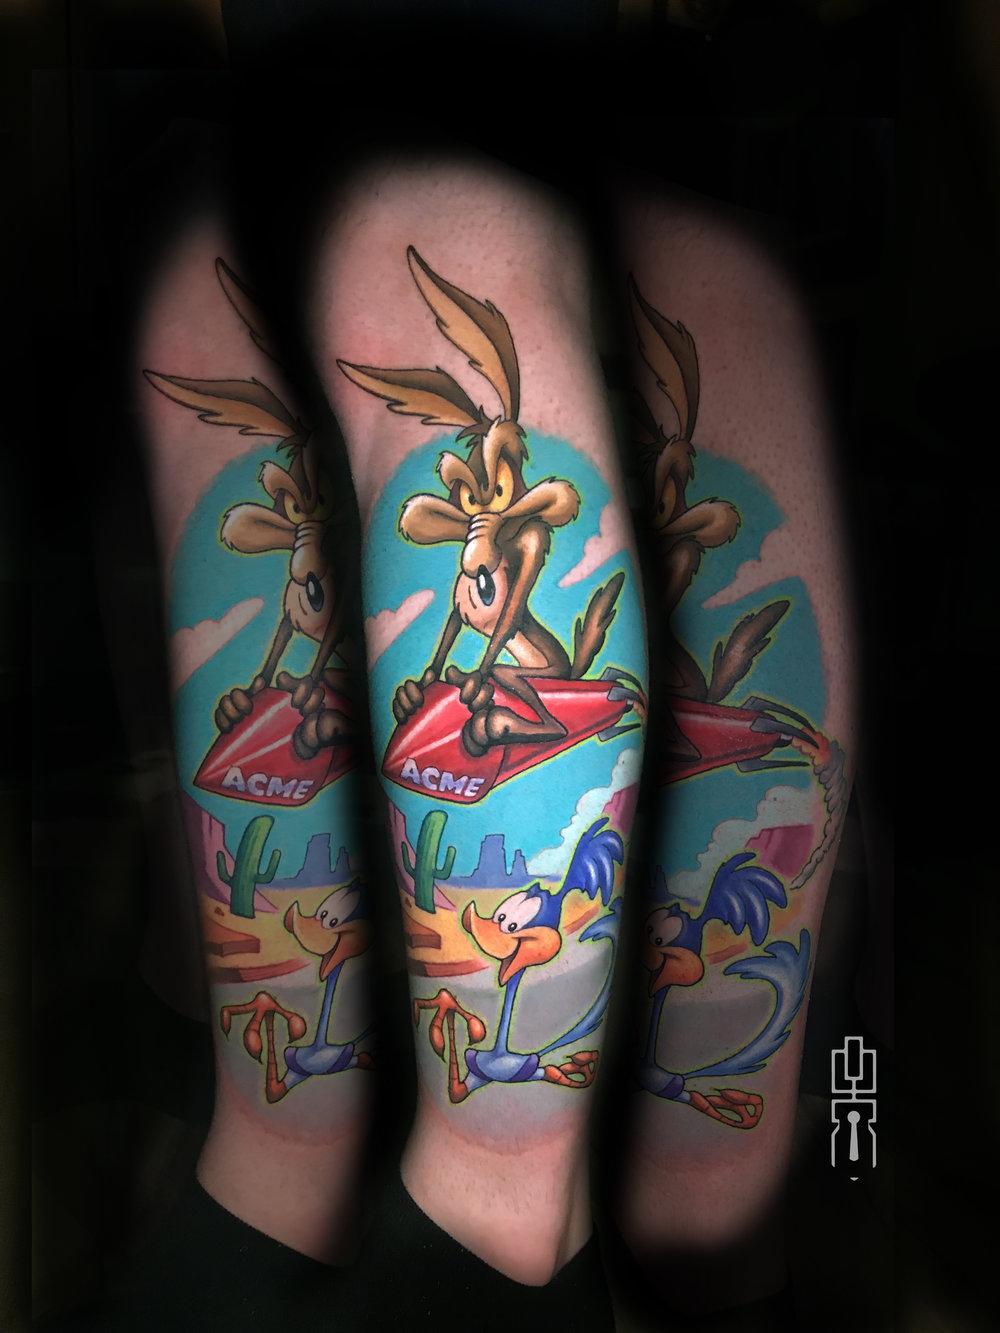 wile e coyote roadrunner looney tunes tattoo.jpg